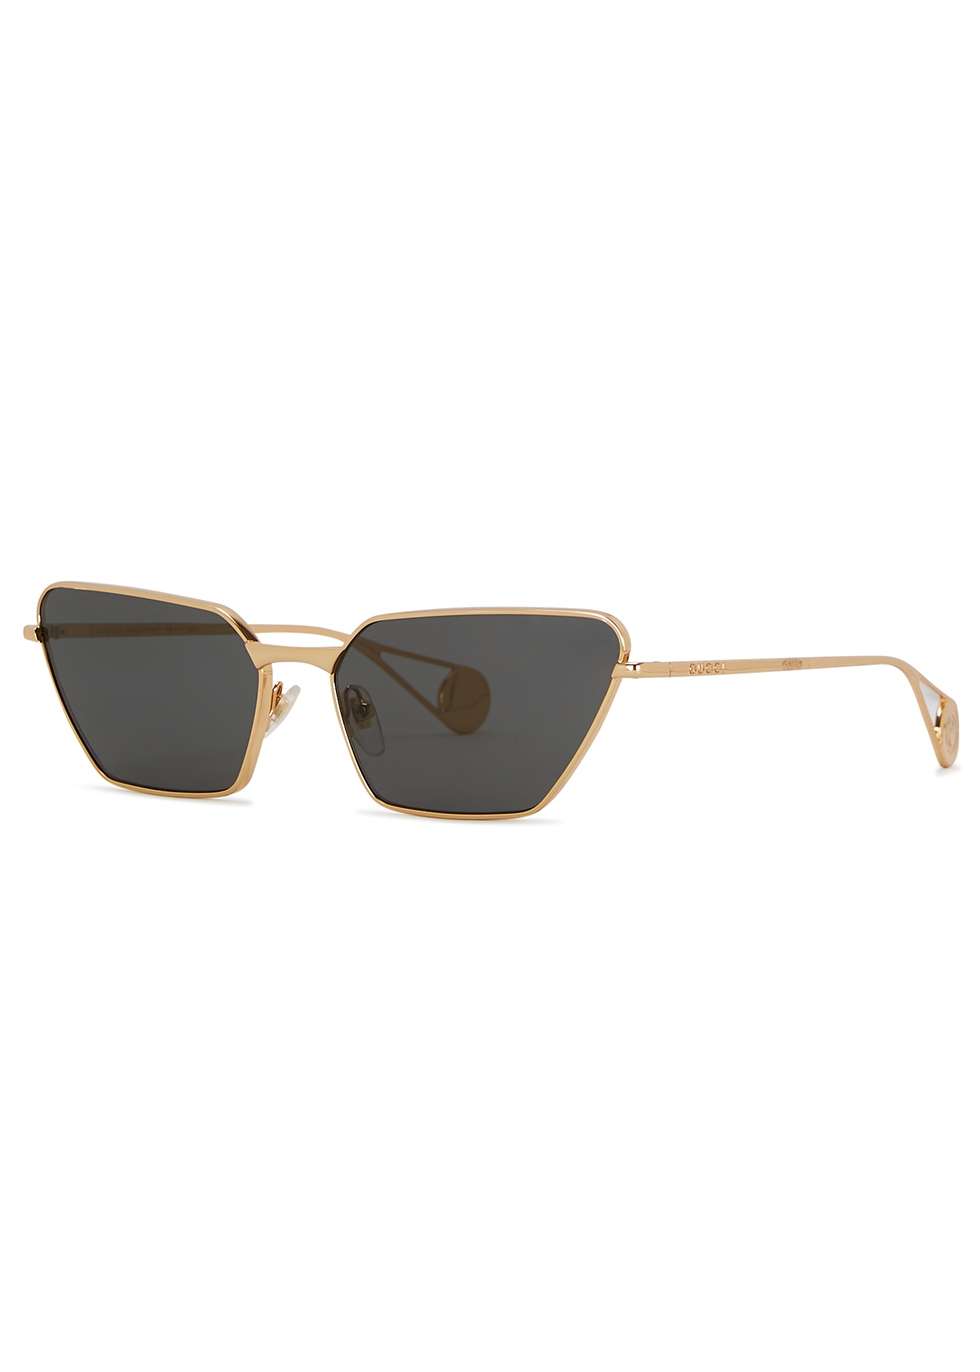 ef7e0f82e3 Women s Designer Sunglasses and Eyewear - Harvey Nichols